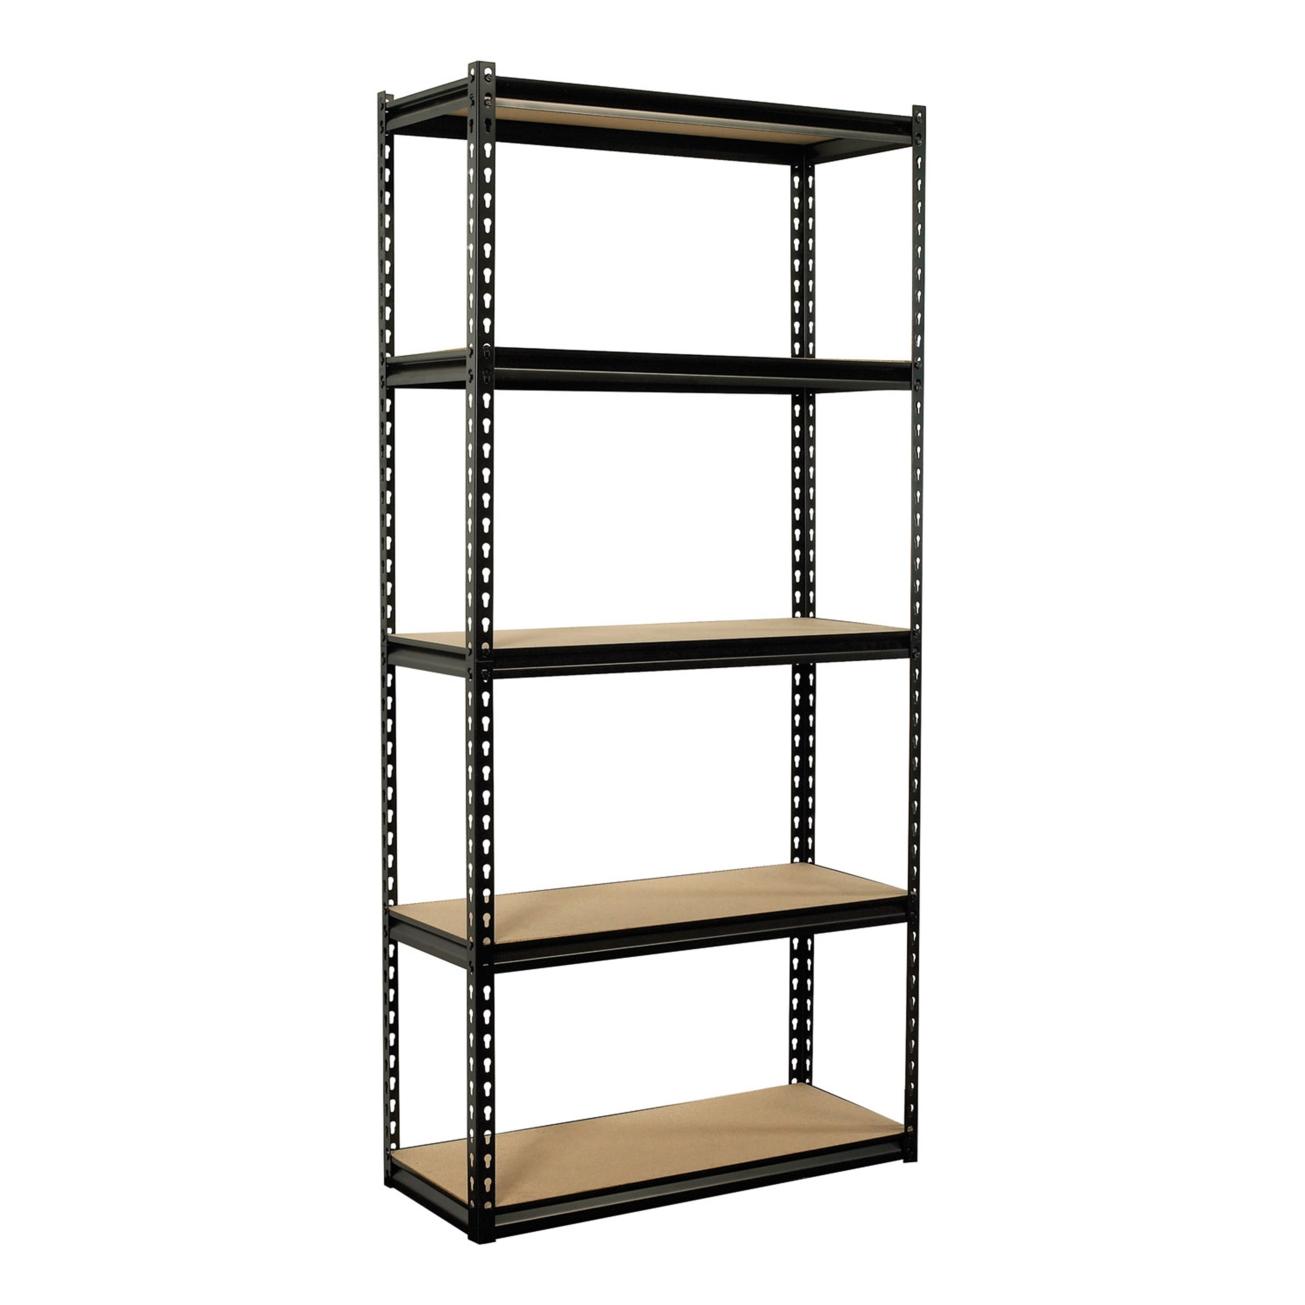 shelving units colossal rack 5 shelf steel shelving unit (csz6-3618-5) - ace RBFXAGQ